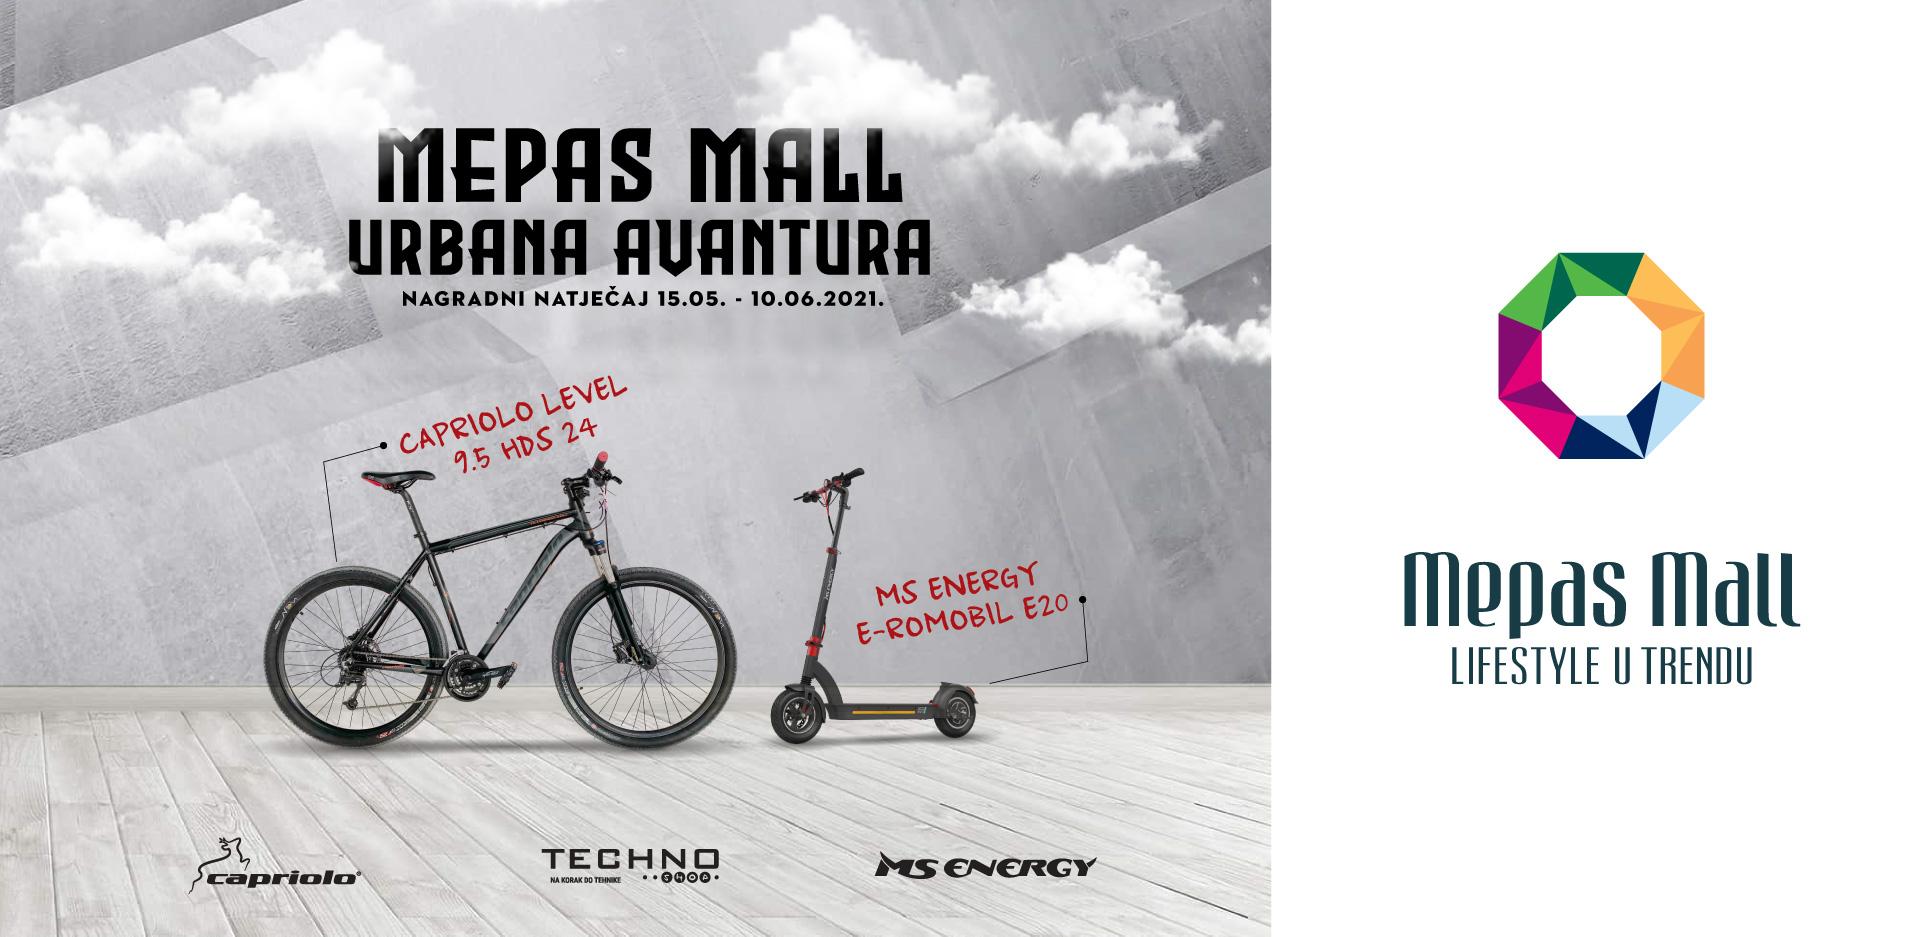 Mepas Mall Urbana avantura